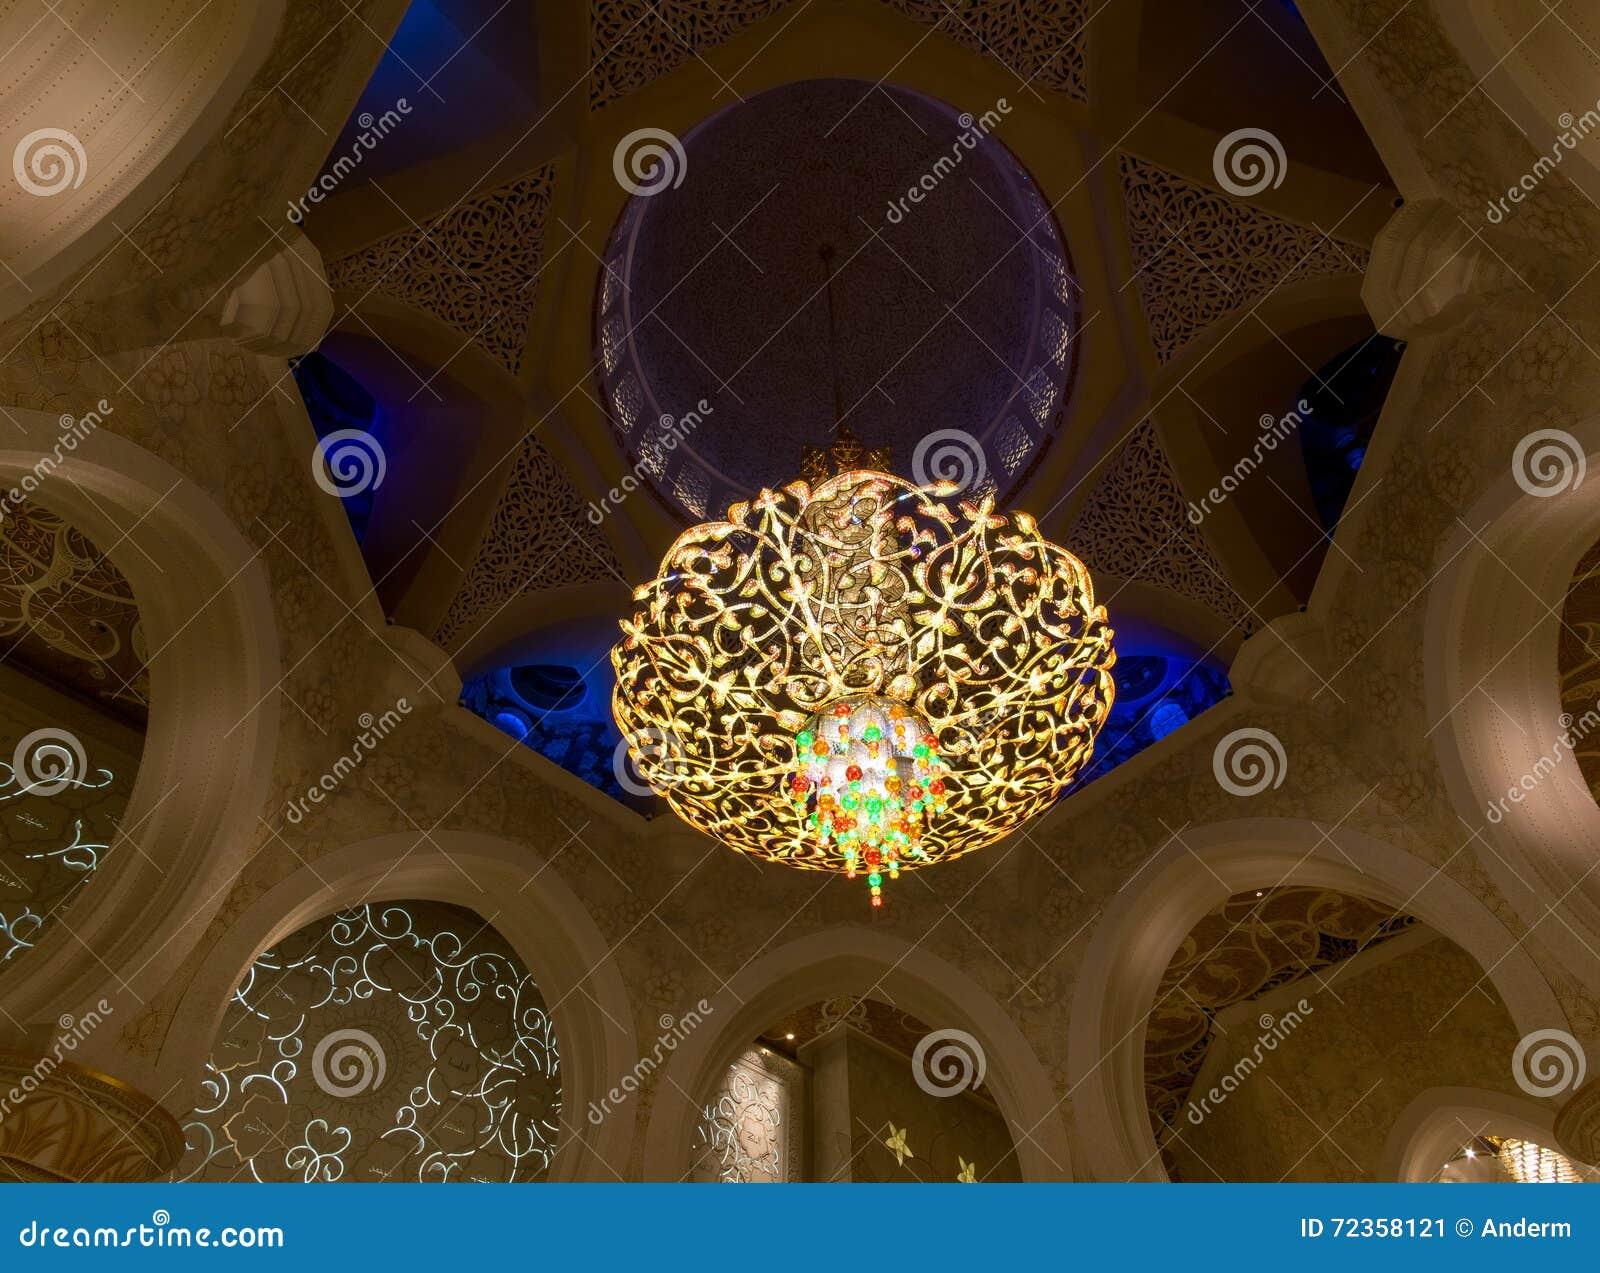 2 abu Al阿拉伯人象比团结的一千阿拉伯联合酋长国框能国家(地区) dhabi eid酋长管辖区四十会集全部hh被启动的关键最大延迟的星期五更多清真寺nahyan编号人位置祷告s总统回教族长苏丹是zayed的崇拜